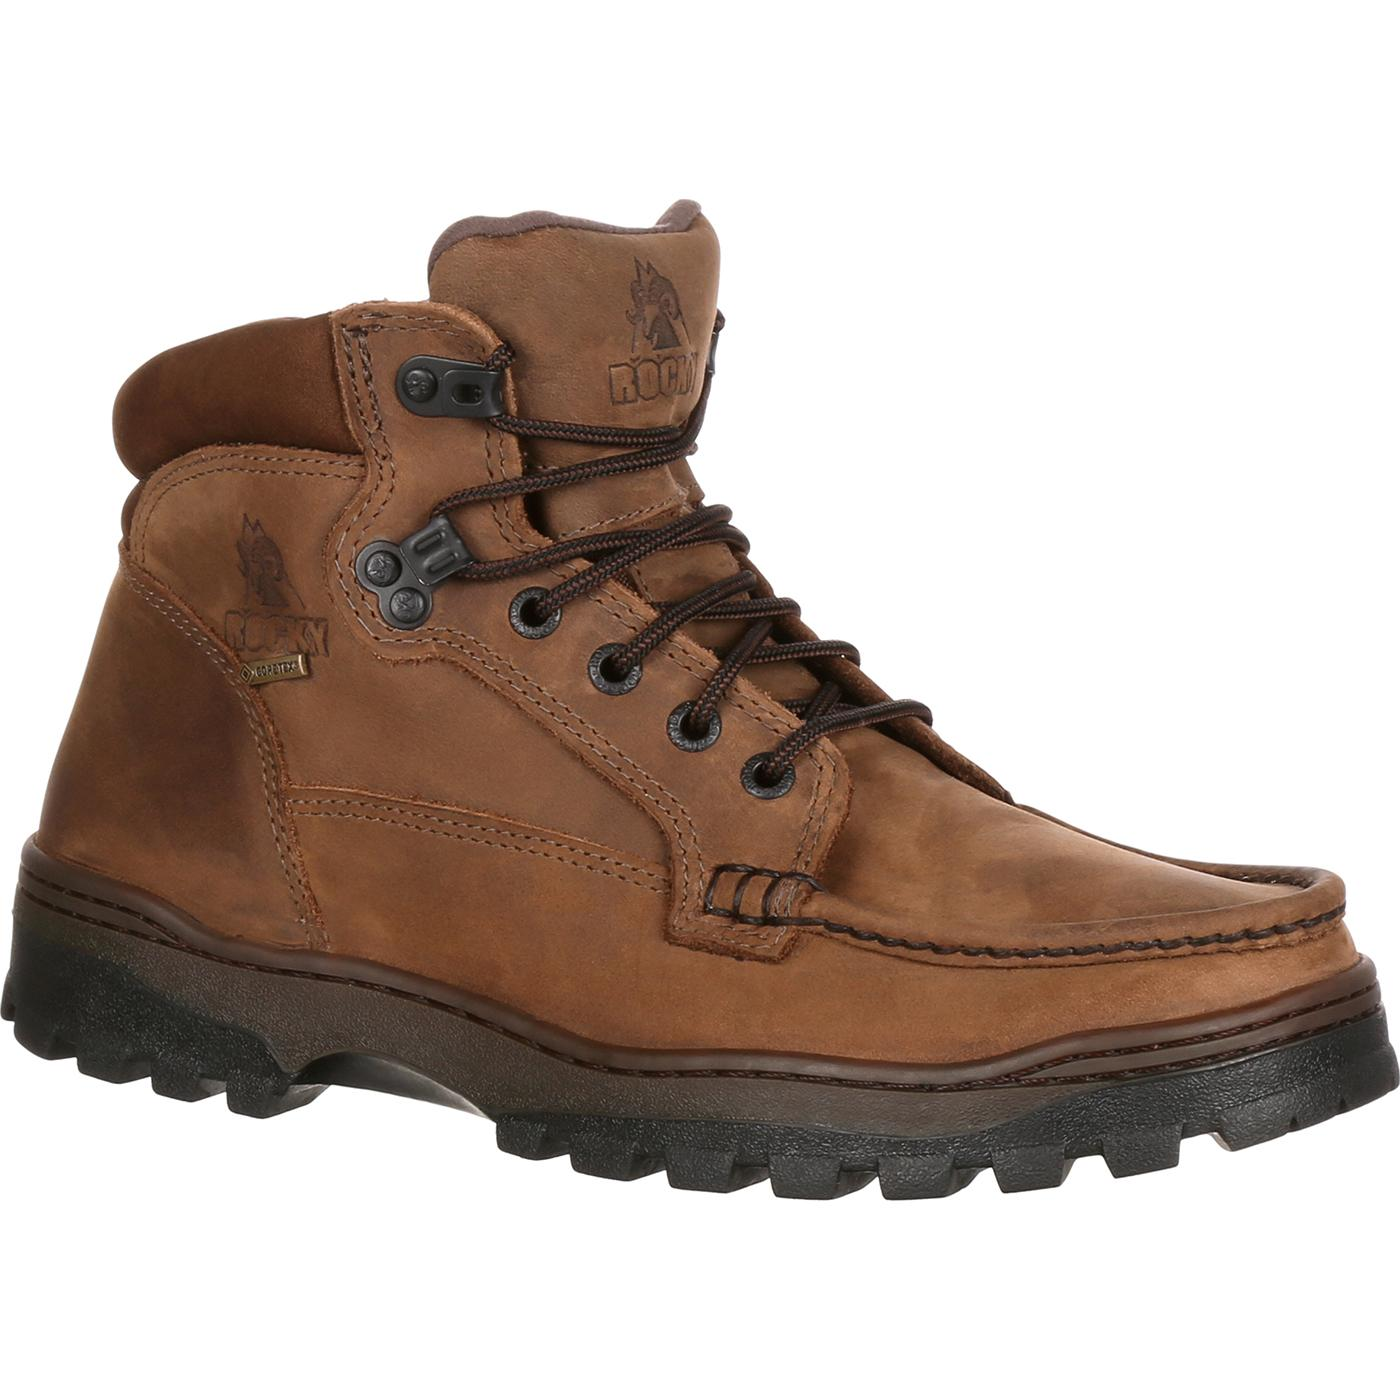 87467356f3b Rocky Outback GORE-TEX® Waterproof Hiker Boot